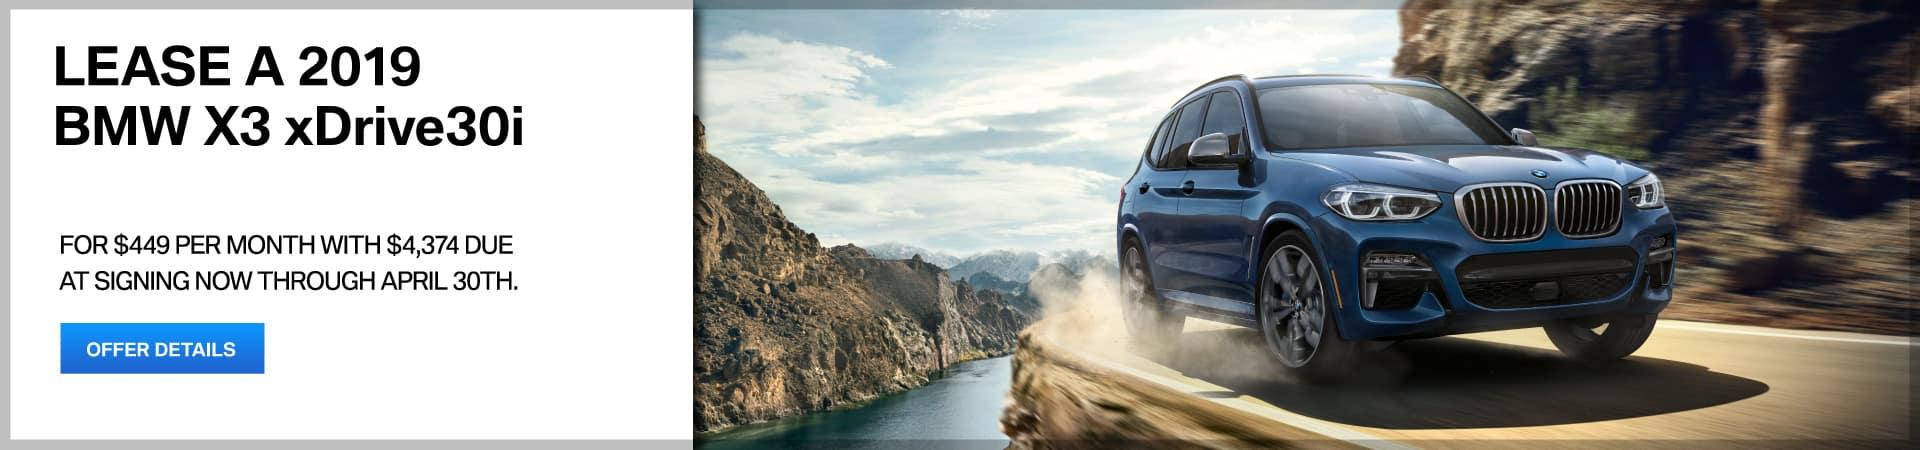 Autobahn BMW - X3 Lease Special